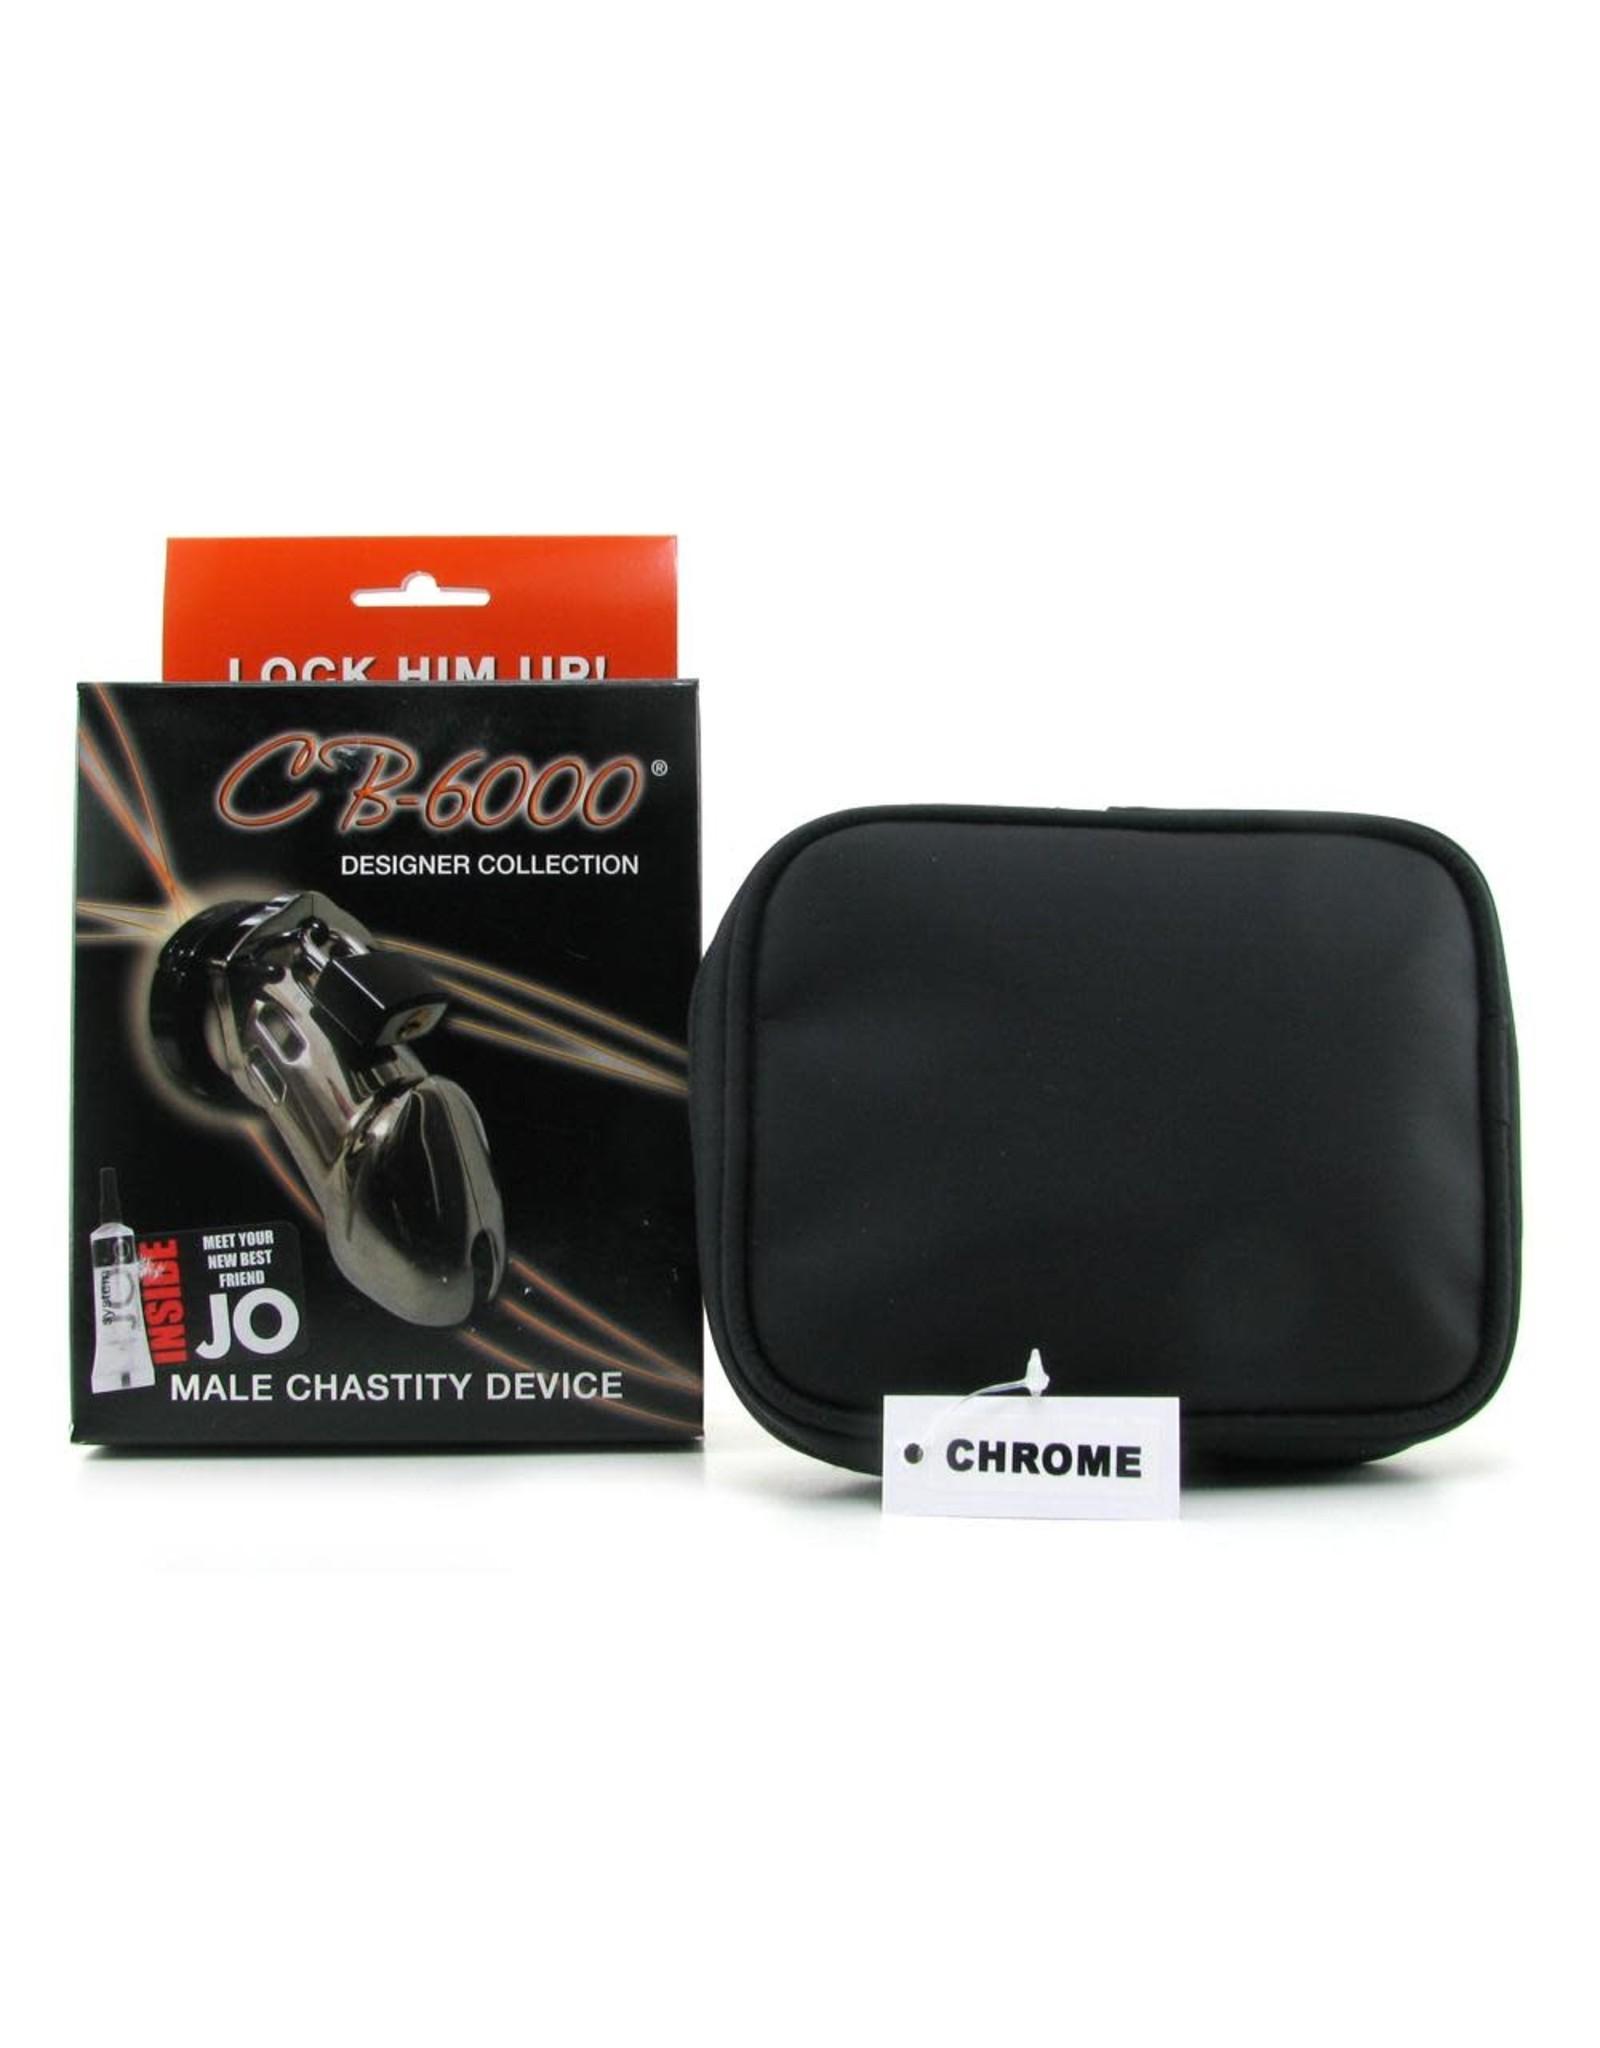 CBX - CB 6000 MALE CHASTITY DEVICE - CHROME 3 1/4 INCH